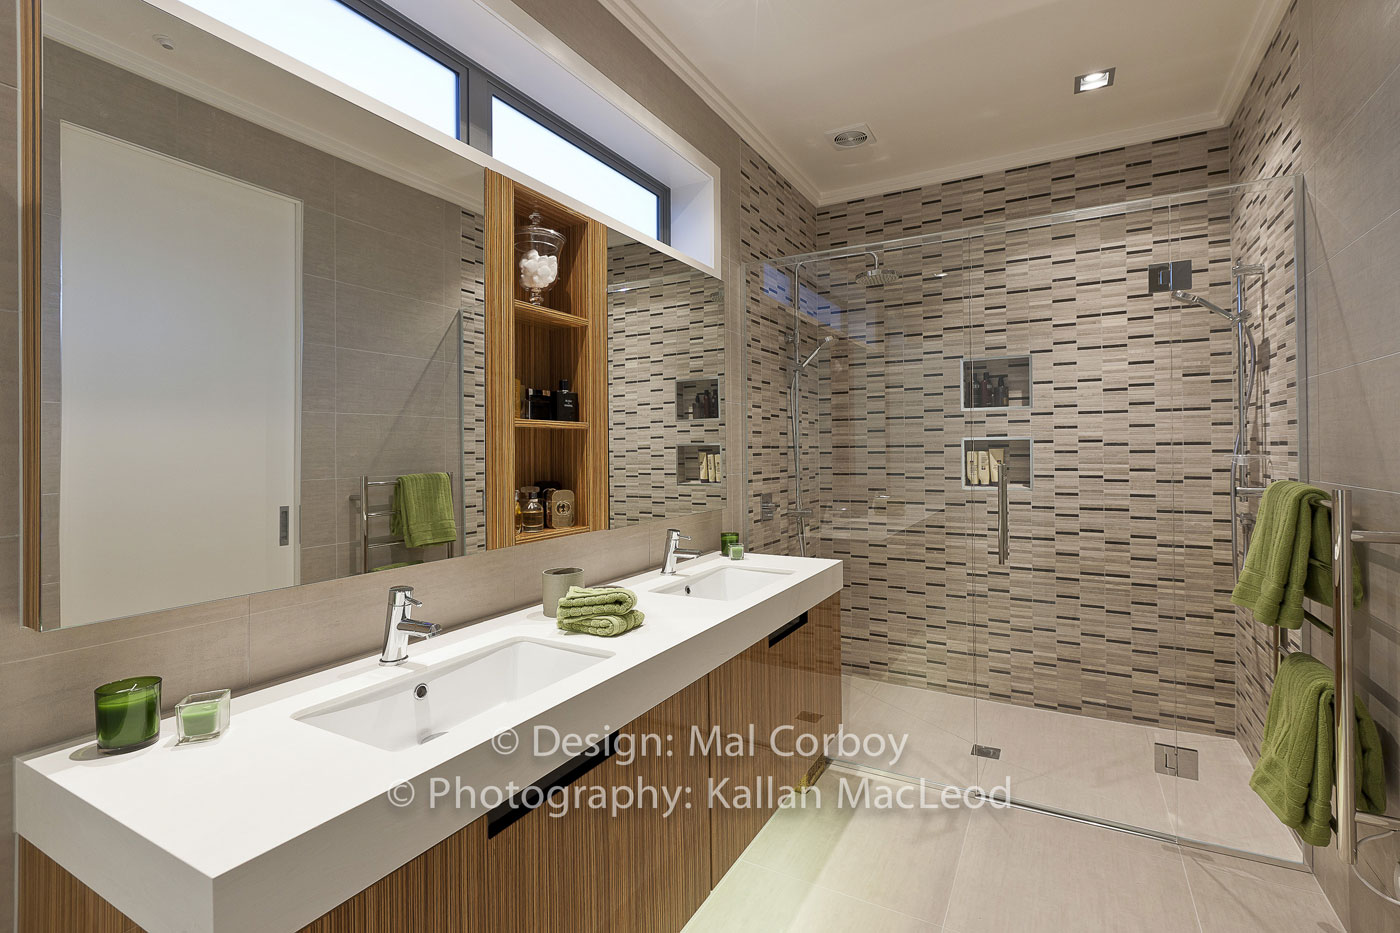 Simon Gualt – Bathroom